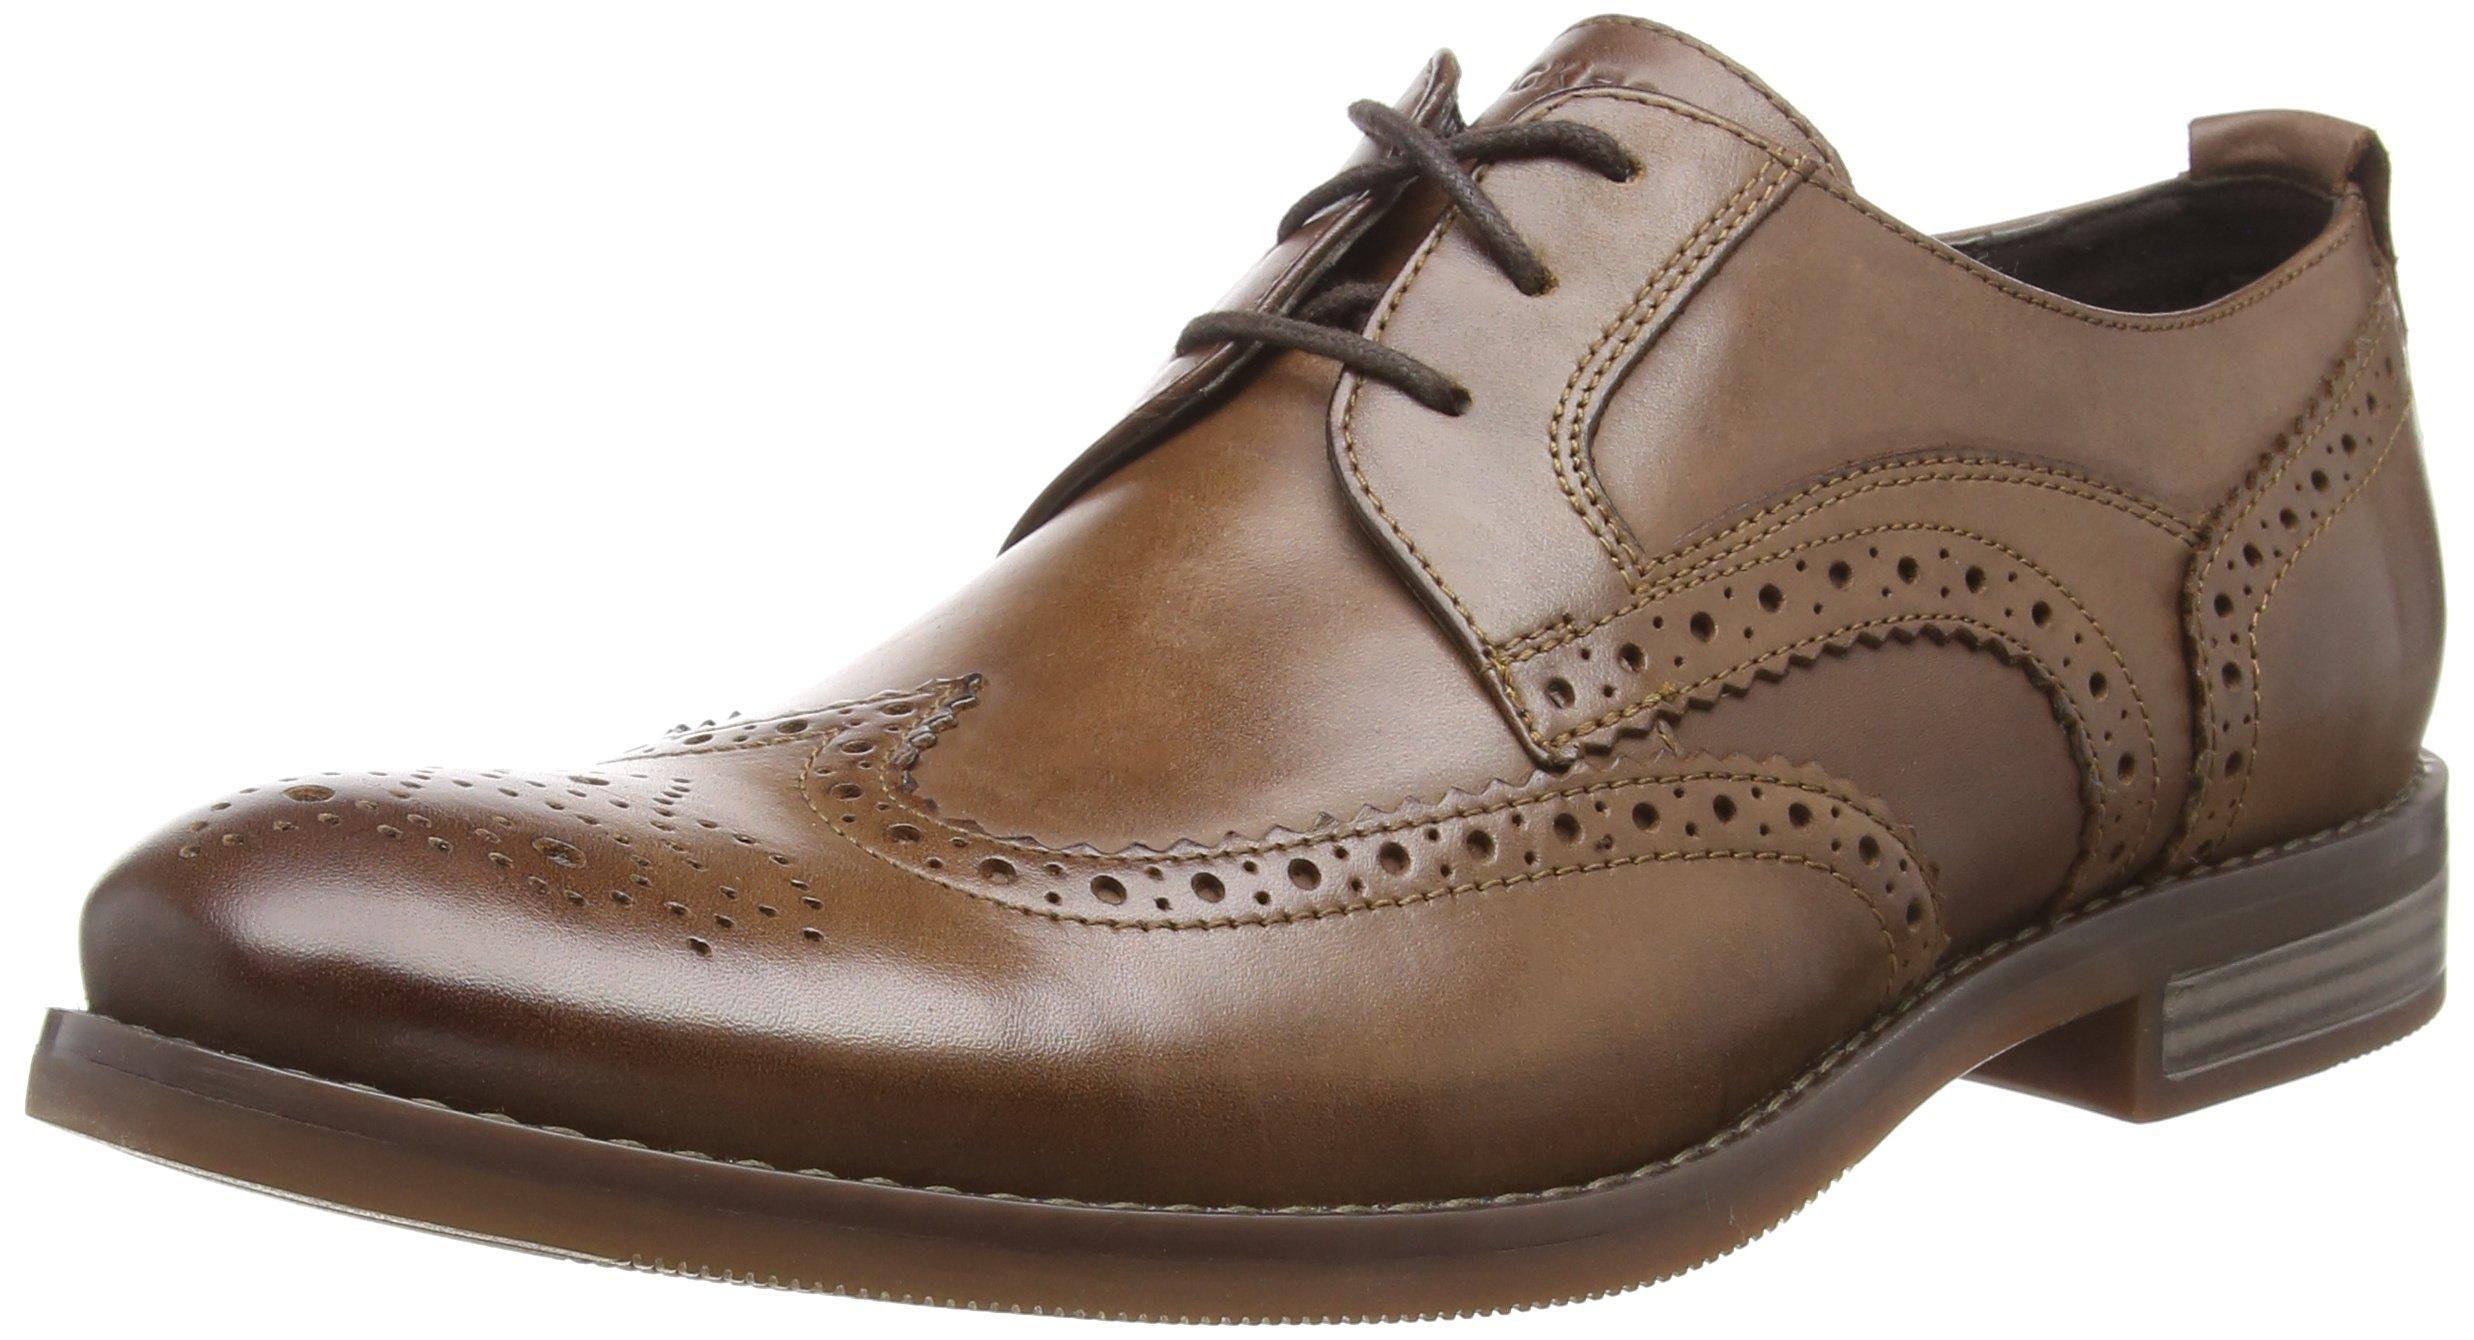 Wynstin Rockport ShoeHommeMarronbrown 00144 Brogue 5 Eu Rj5AL3q4